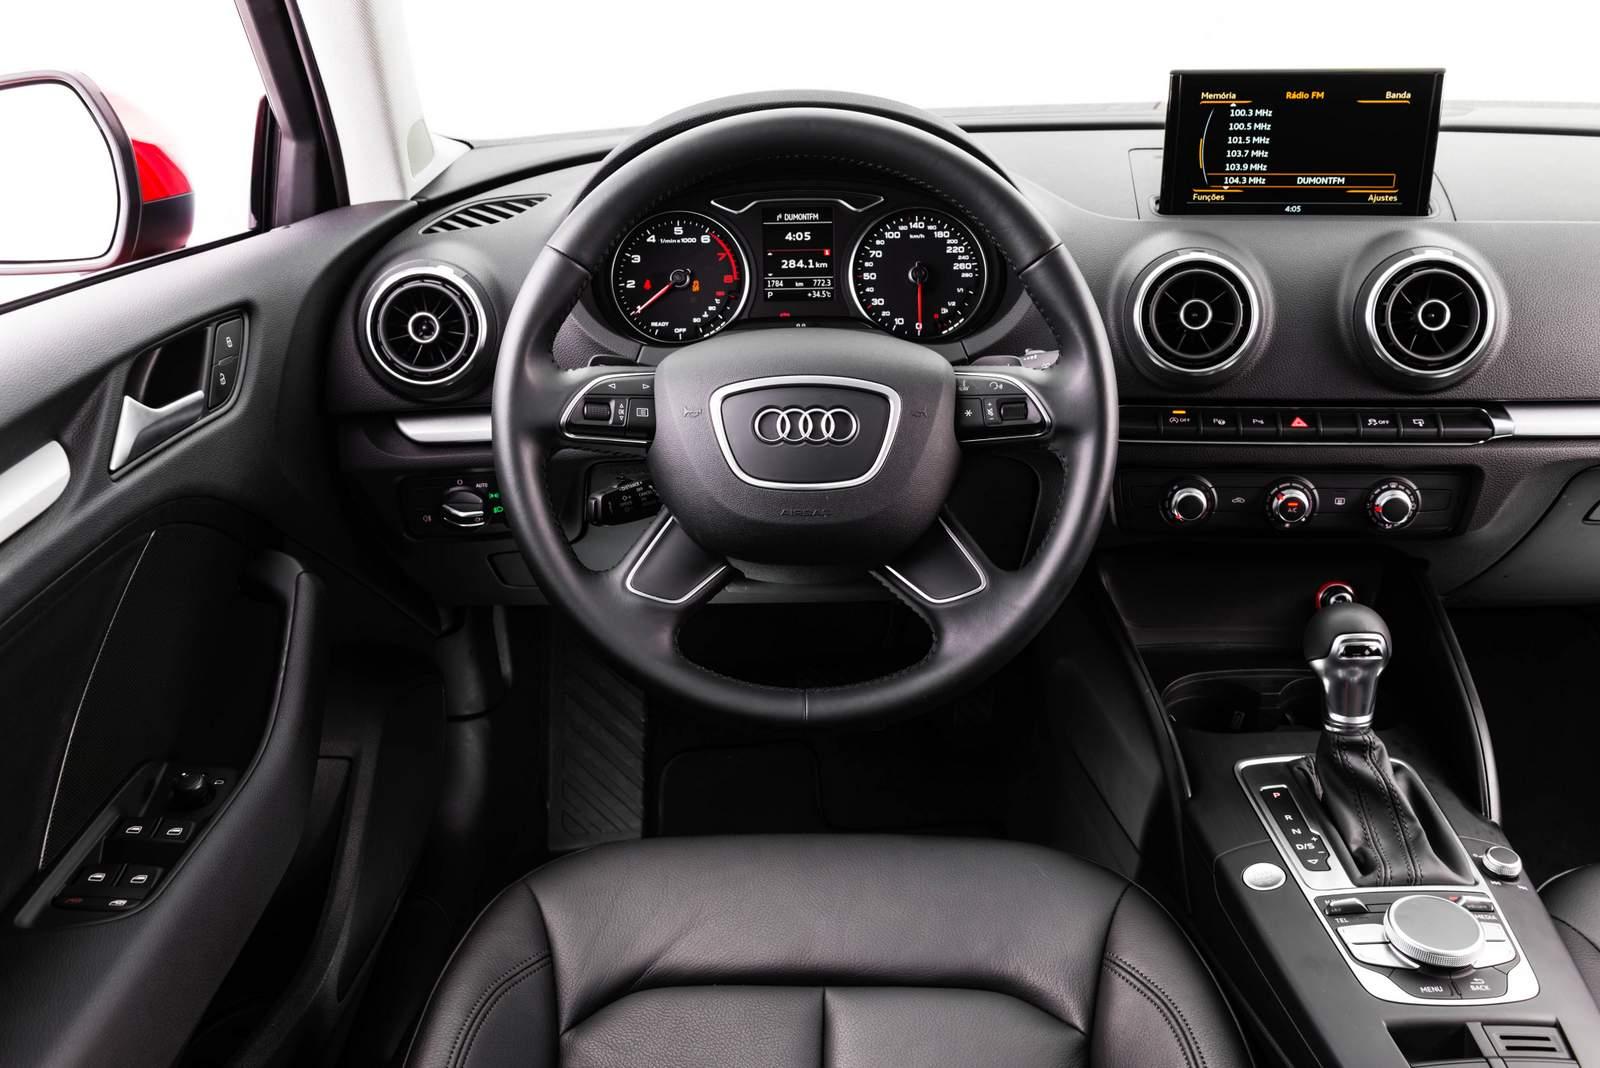 Audi A3: interior caprichado